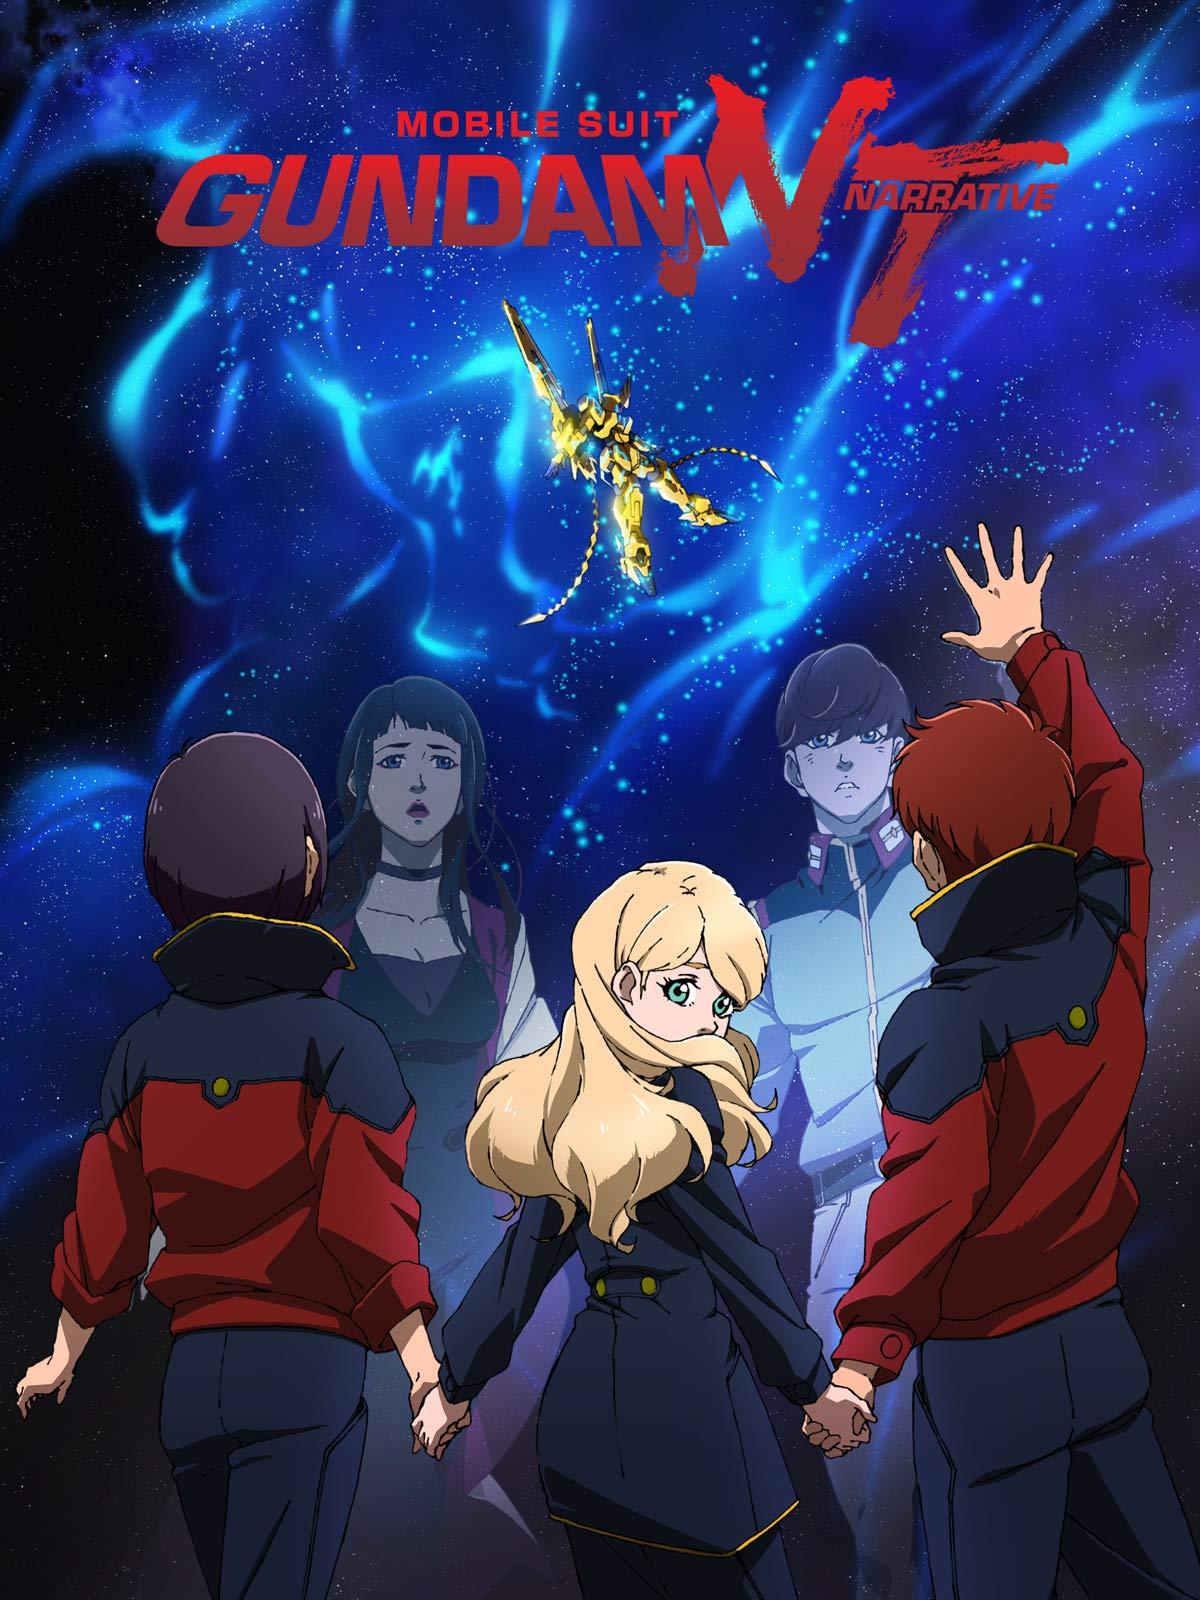 Watch Mobile Suit Gundam Nt Narrative Subtitled Prime Video